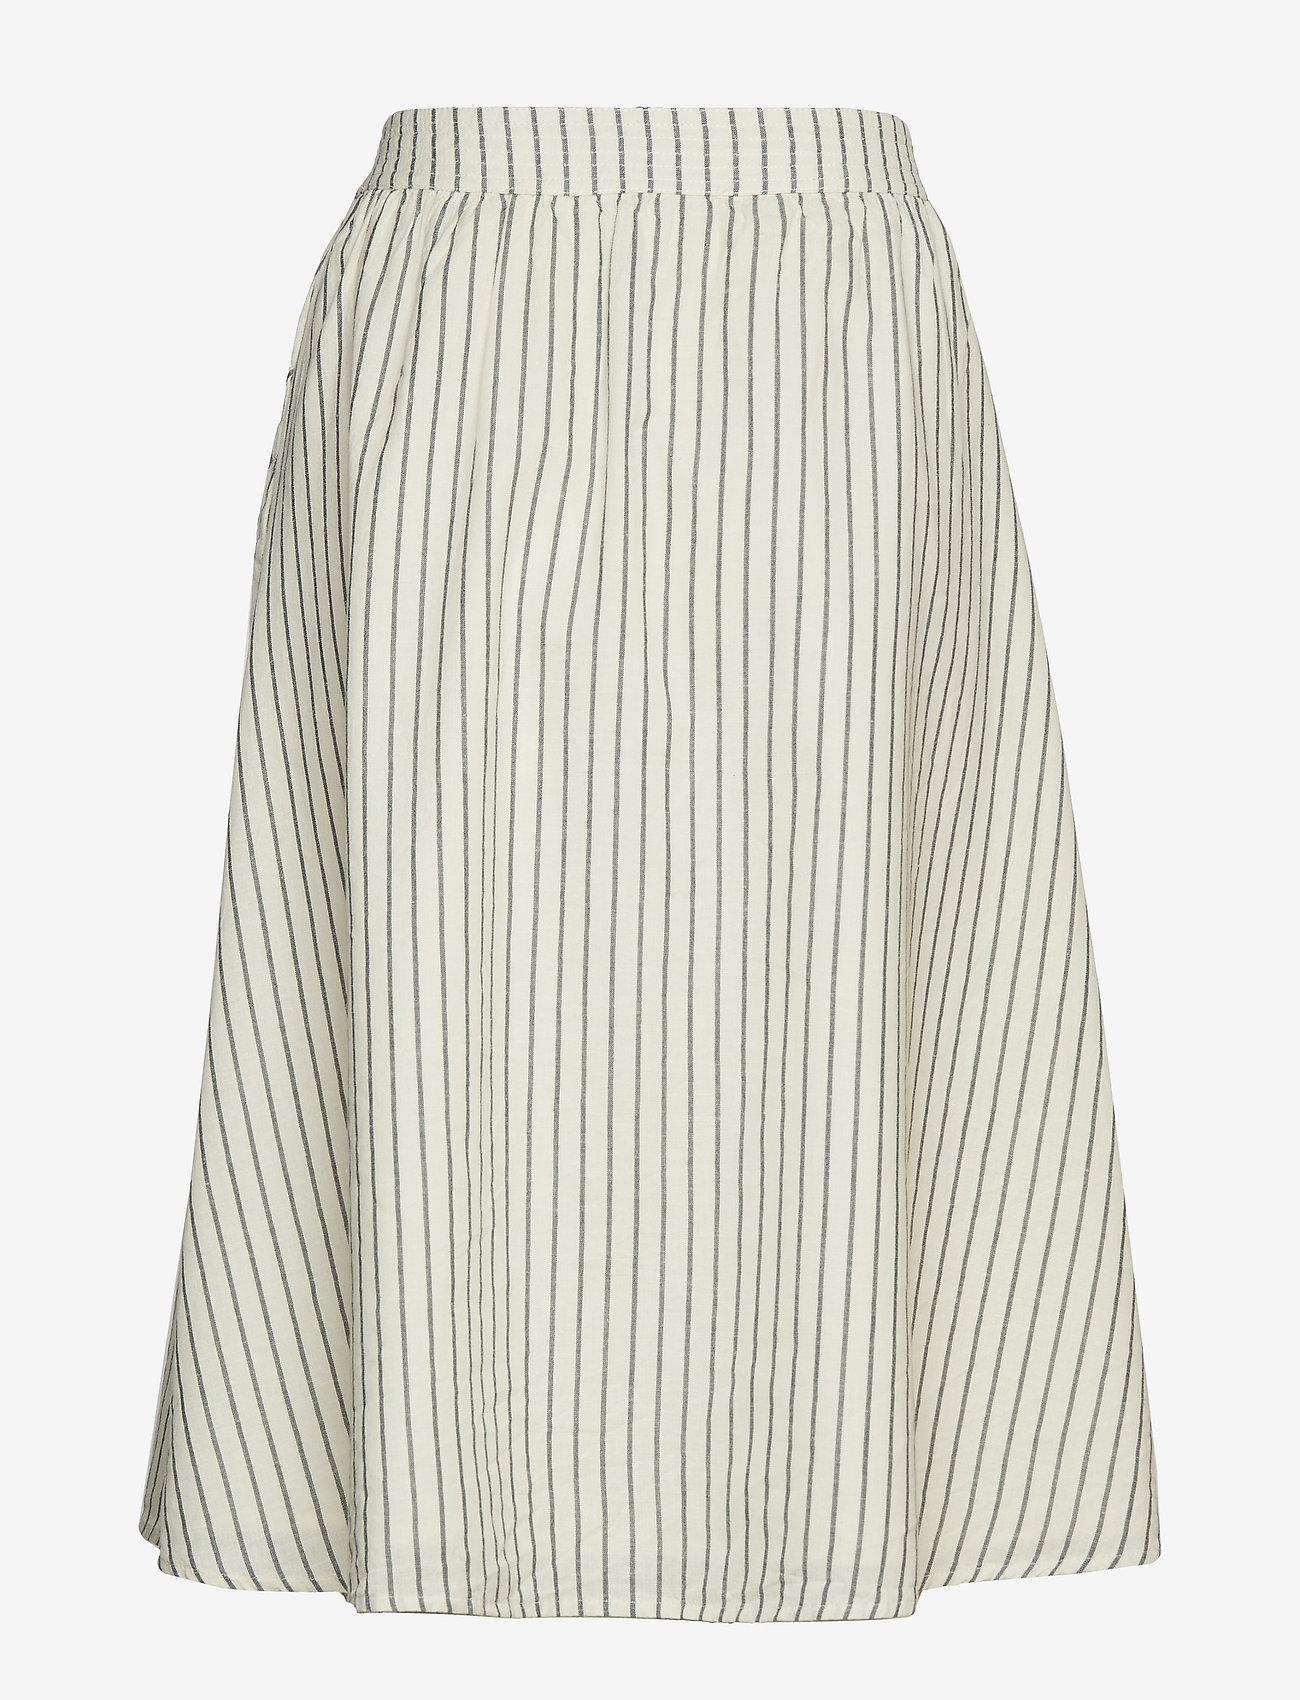 Esprit Casual - Skirts light woven - midi skirts - off white 2 - 1